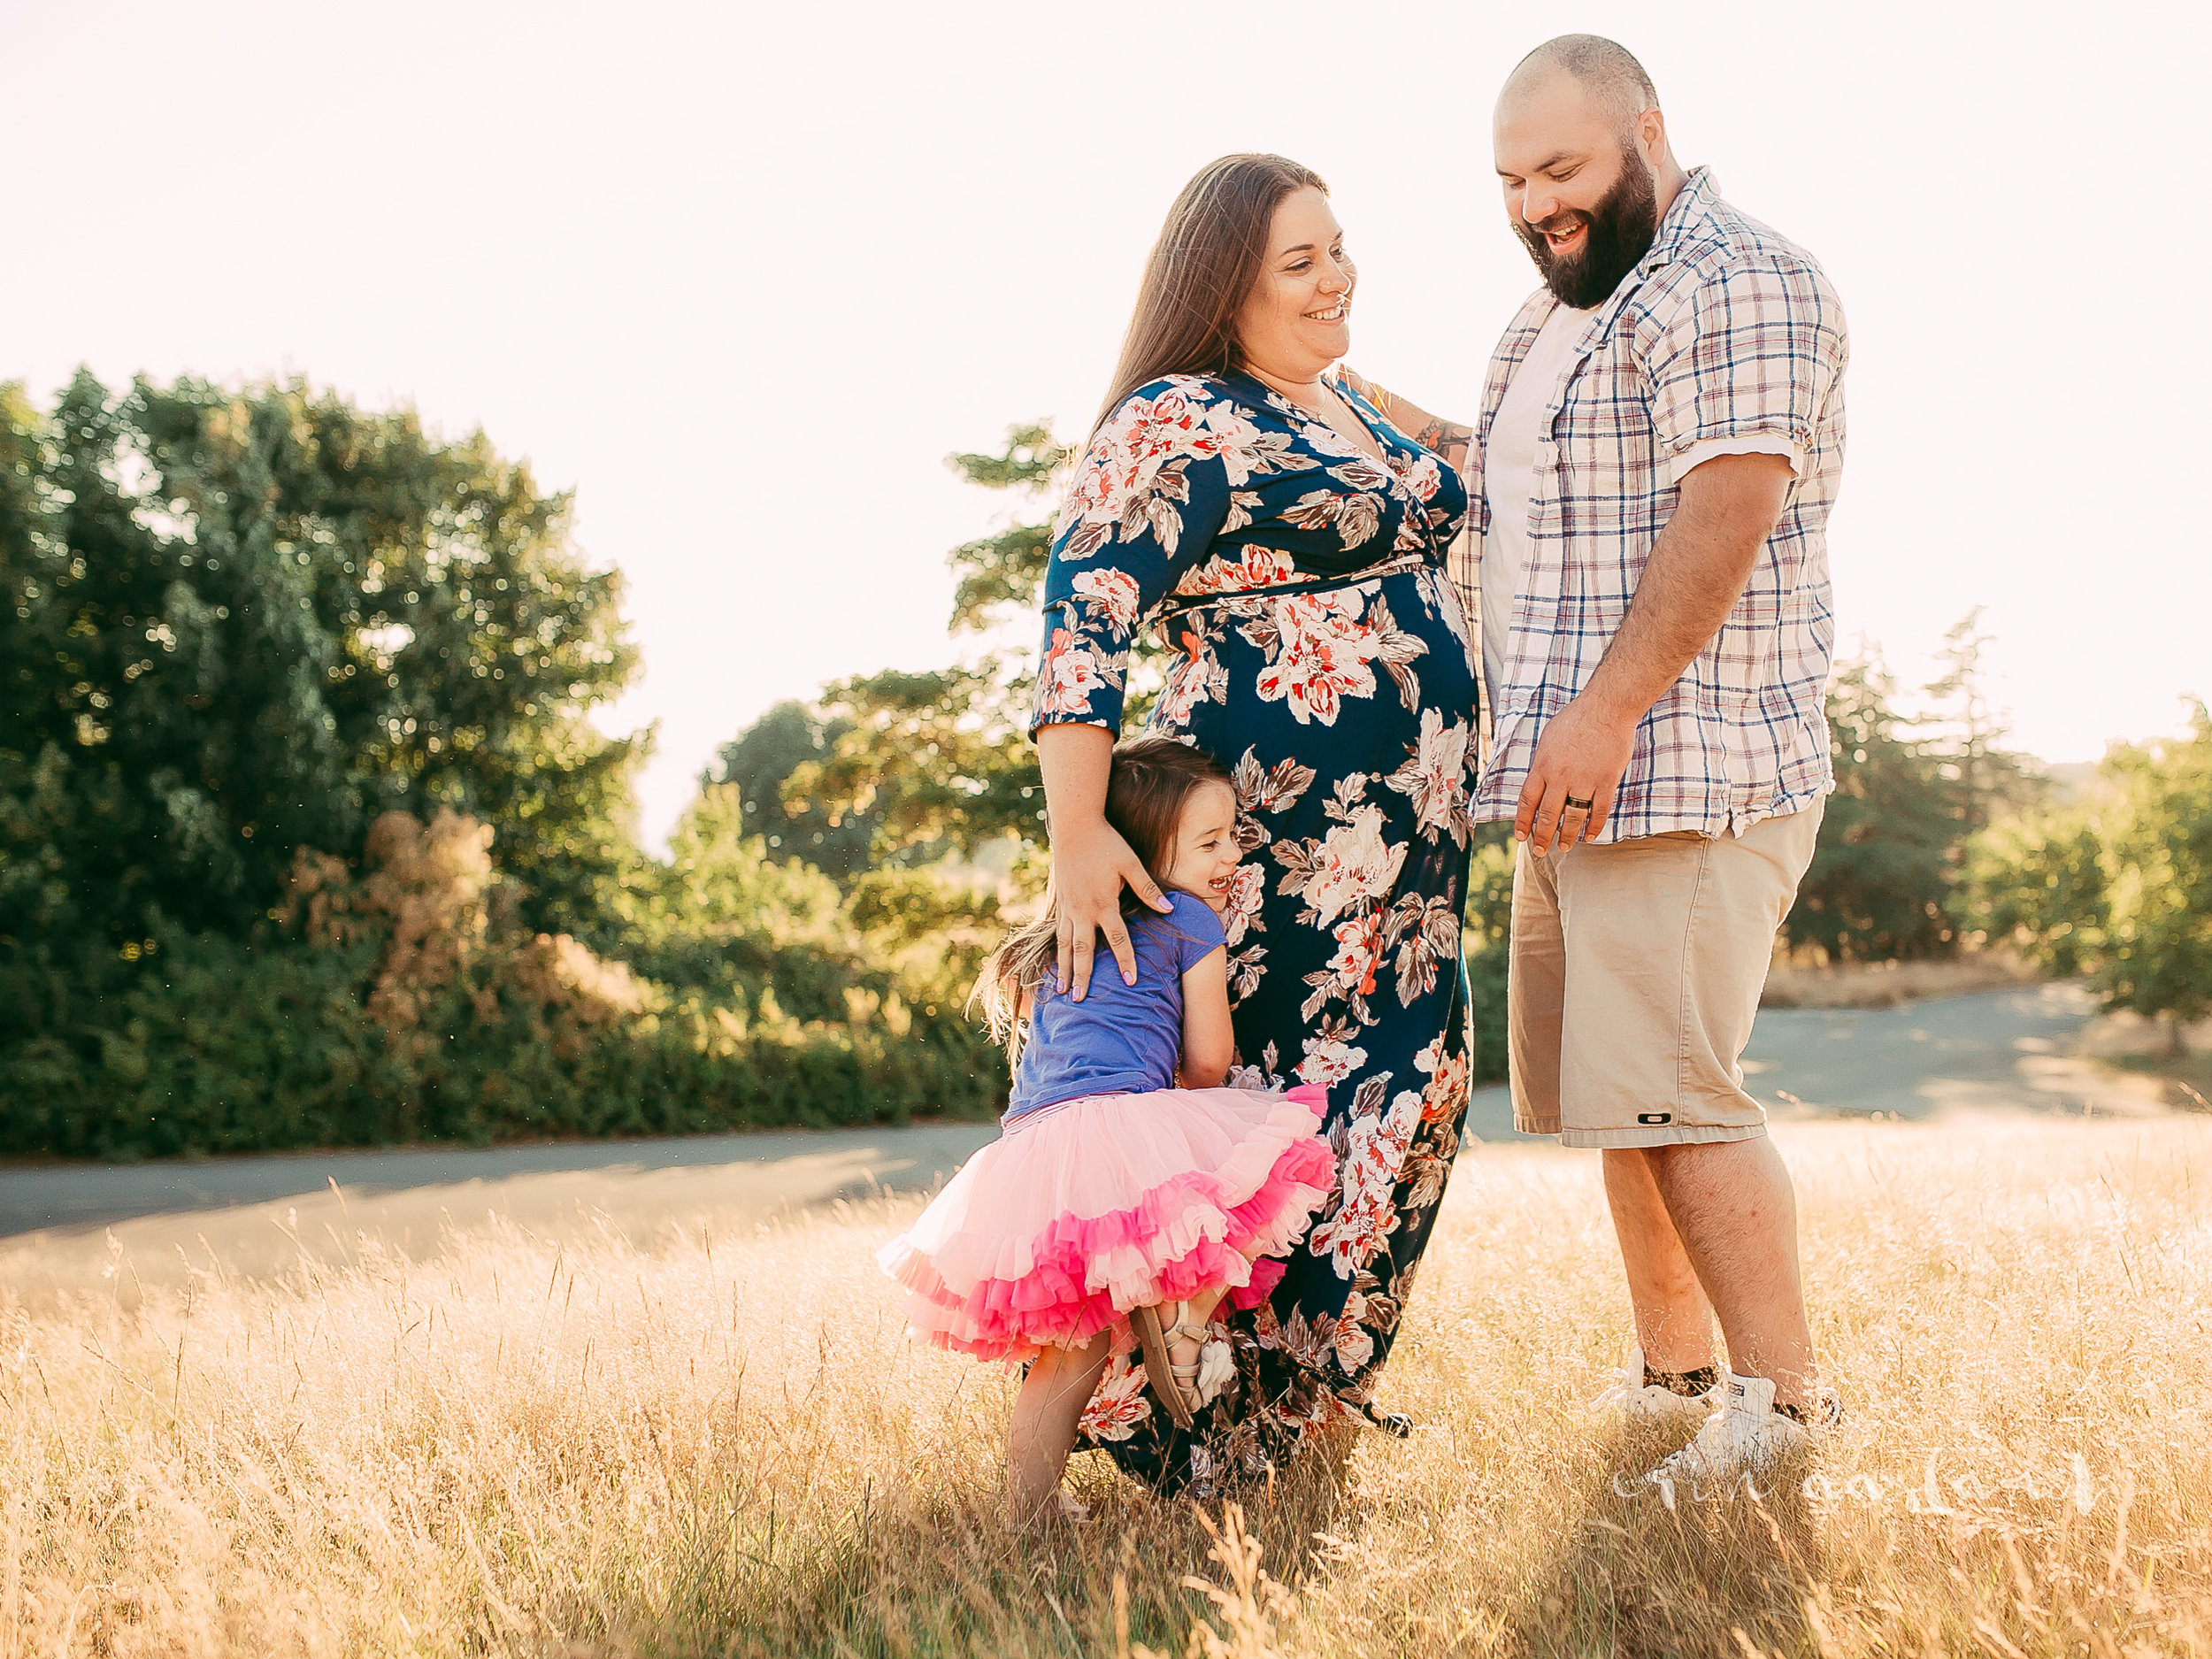 Erin Aasland Snoqualmie Family Photographer love field embrace